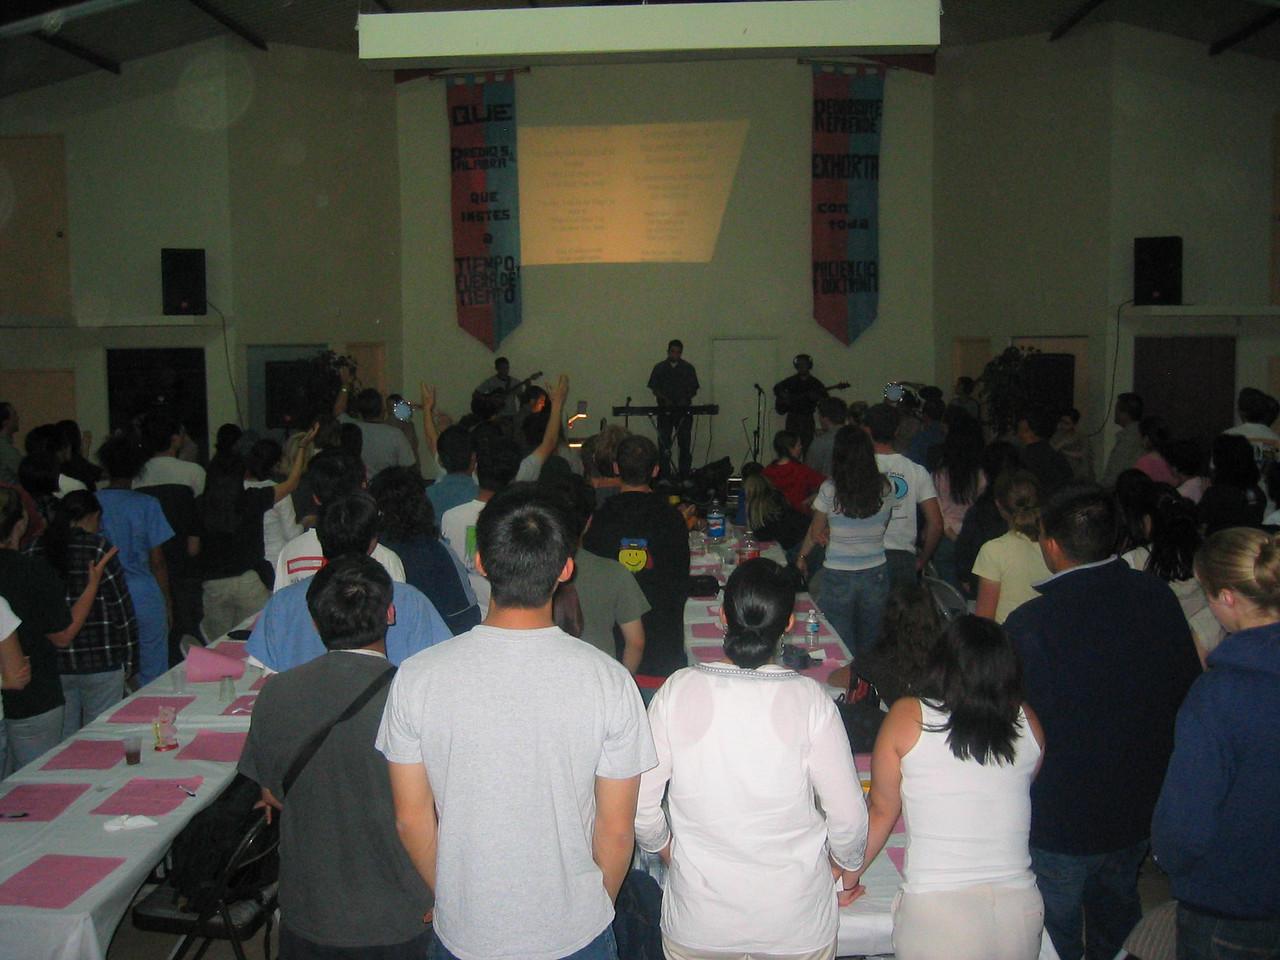 2004 05 30 Sunday night - Hosting church dinner music worship